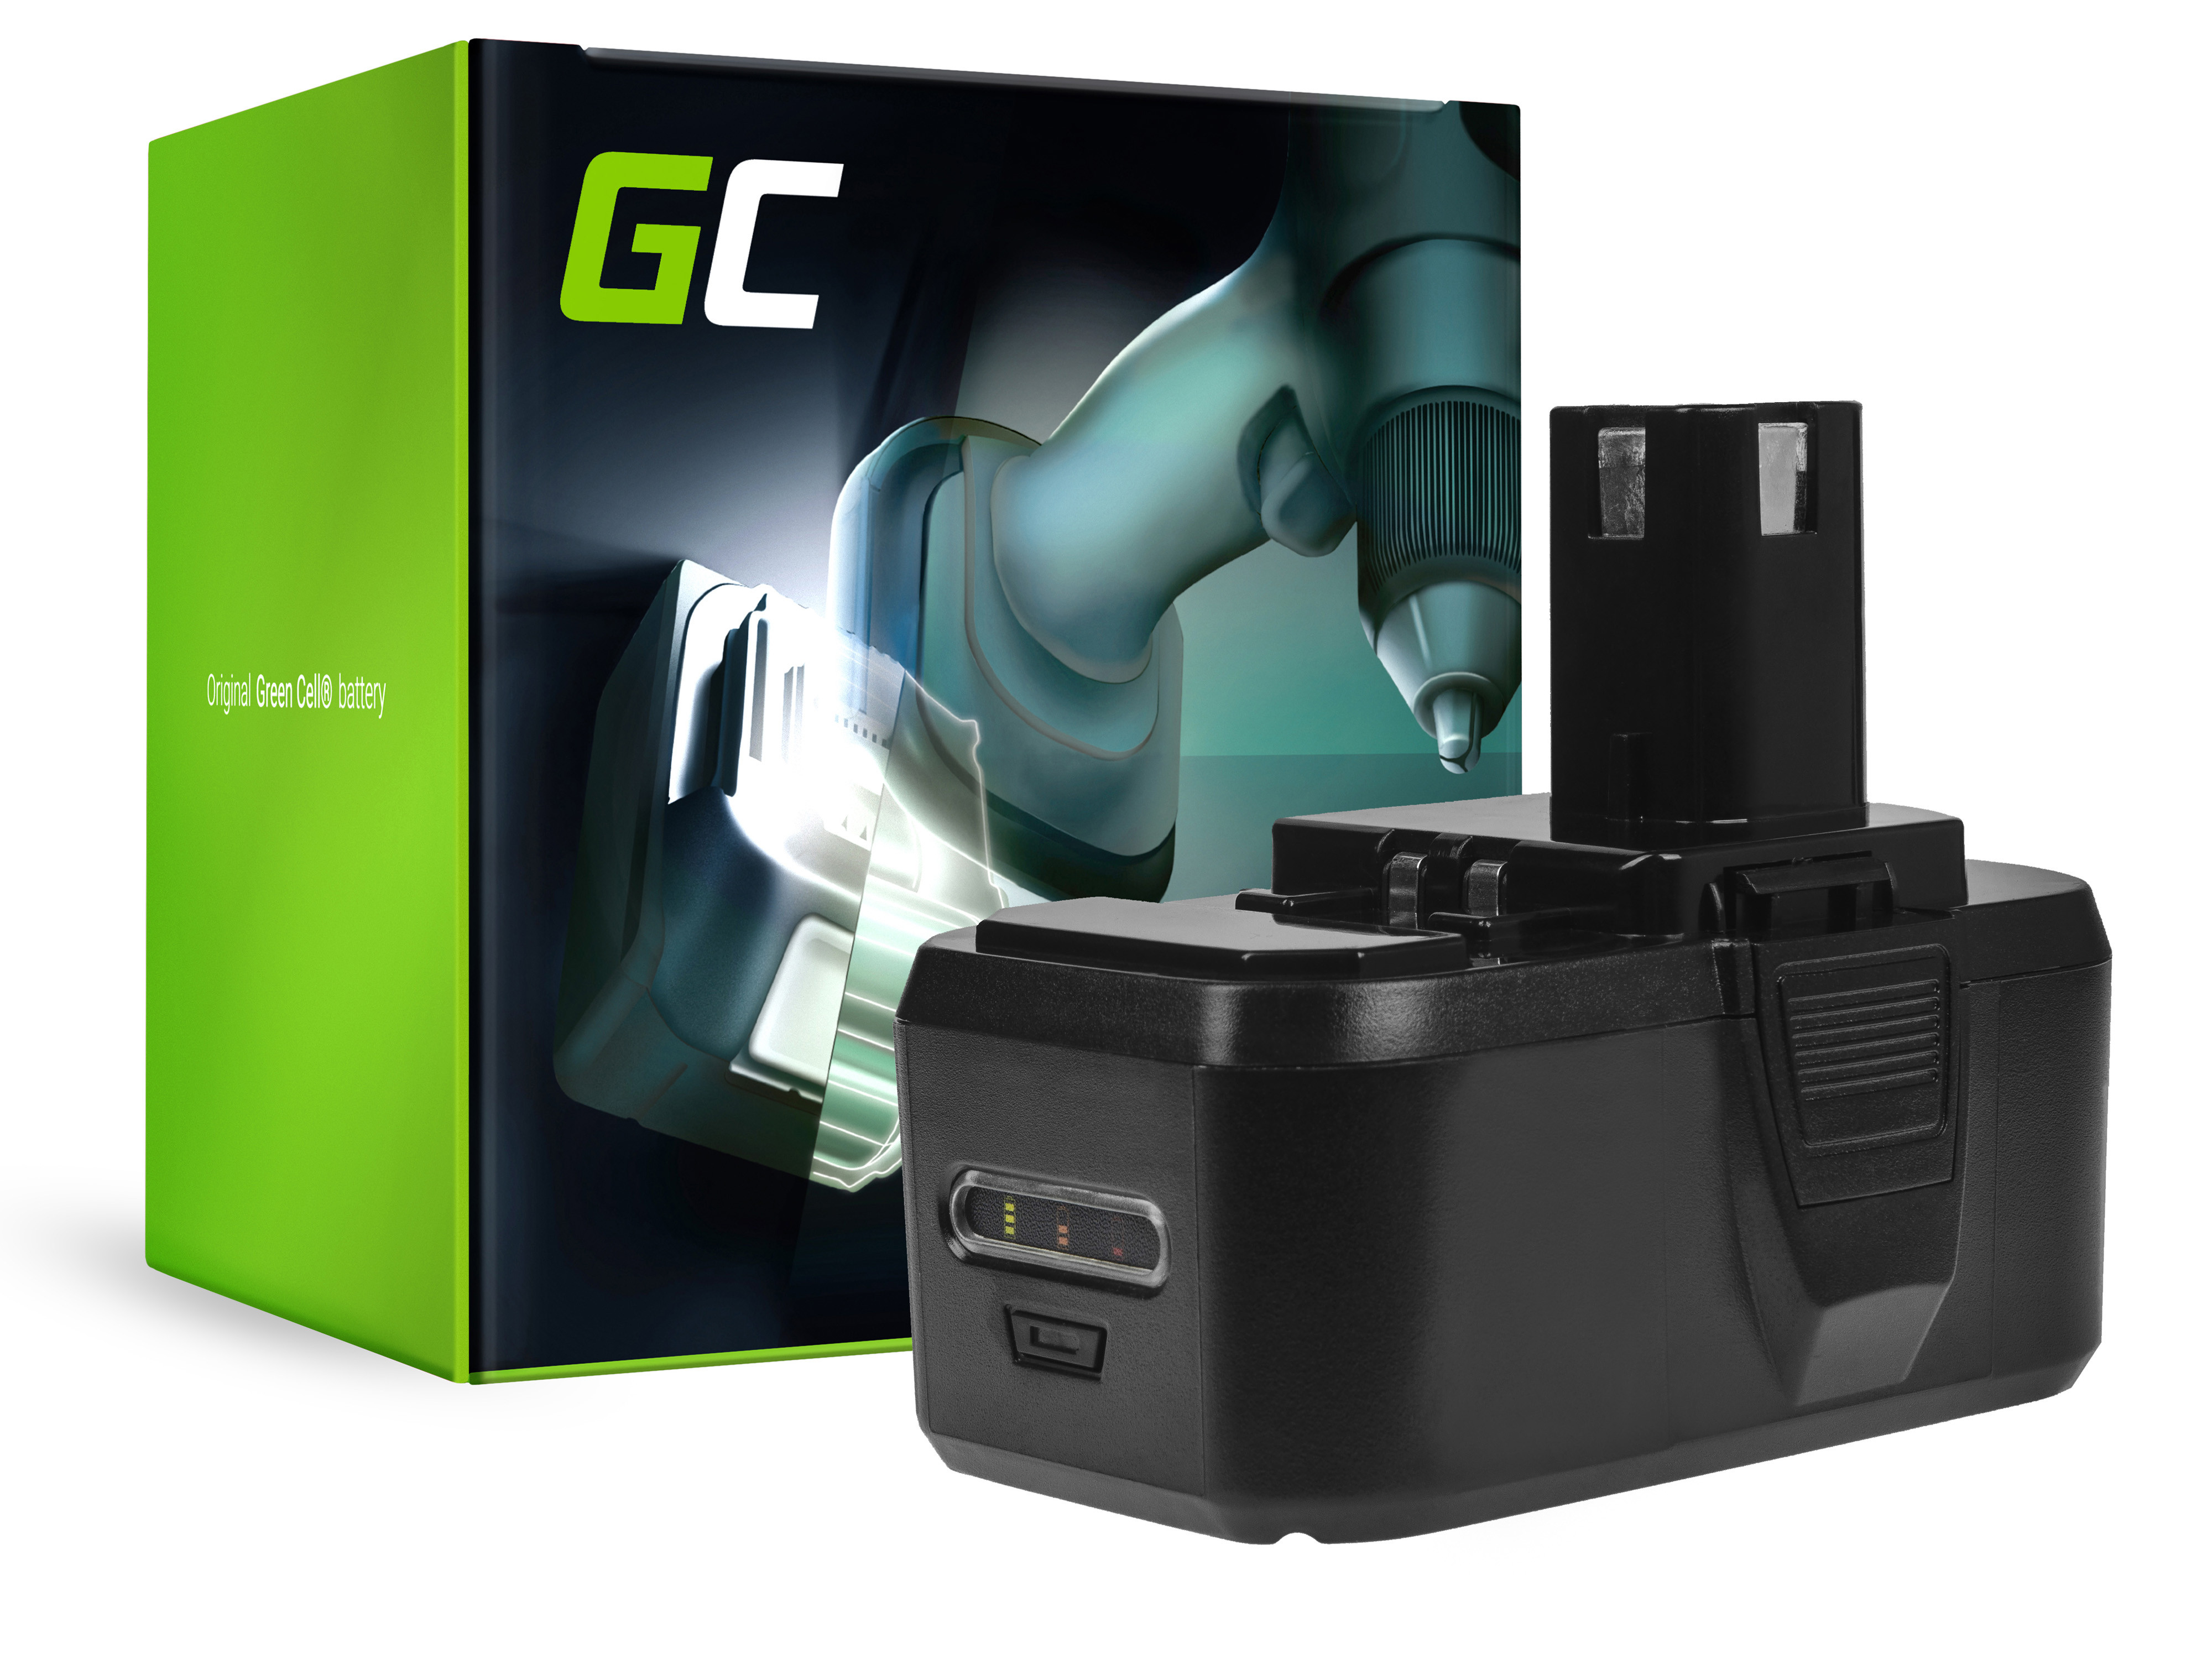 Green Cell PT193 Baterie Ryobi ONE + RB18L50,RB18L15,RYOBI R18AG0 R18JS0 R18PDBL RCD18022L RID1801M RMT1801M 18V 4000mAh Li-ion - neoriginální